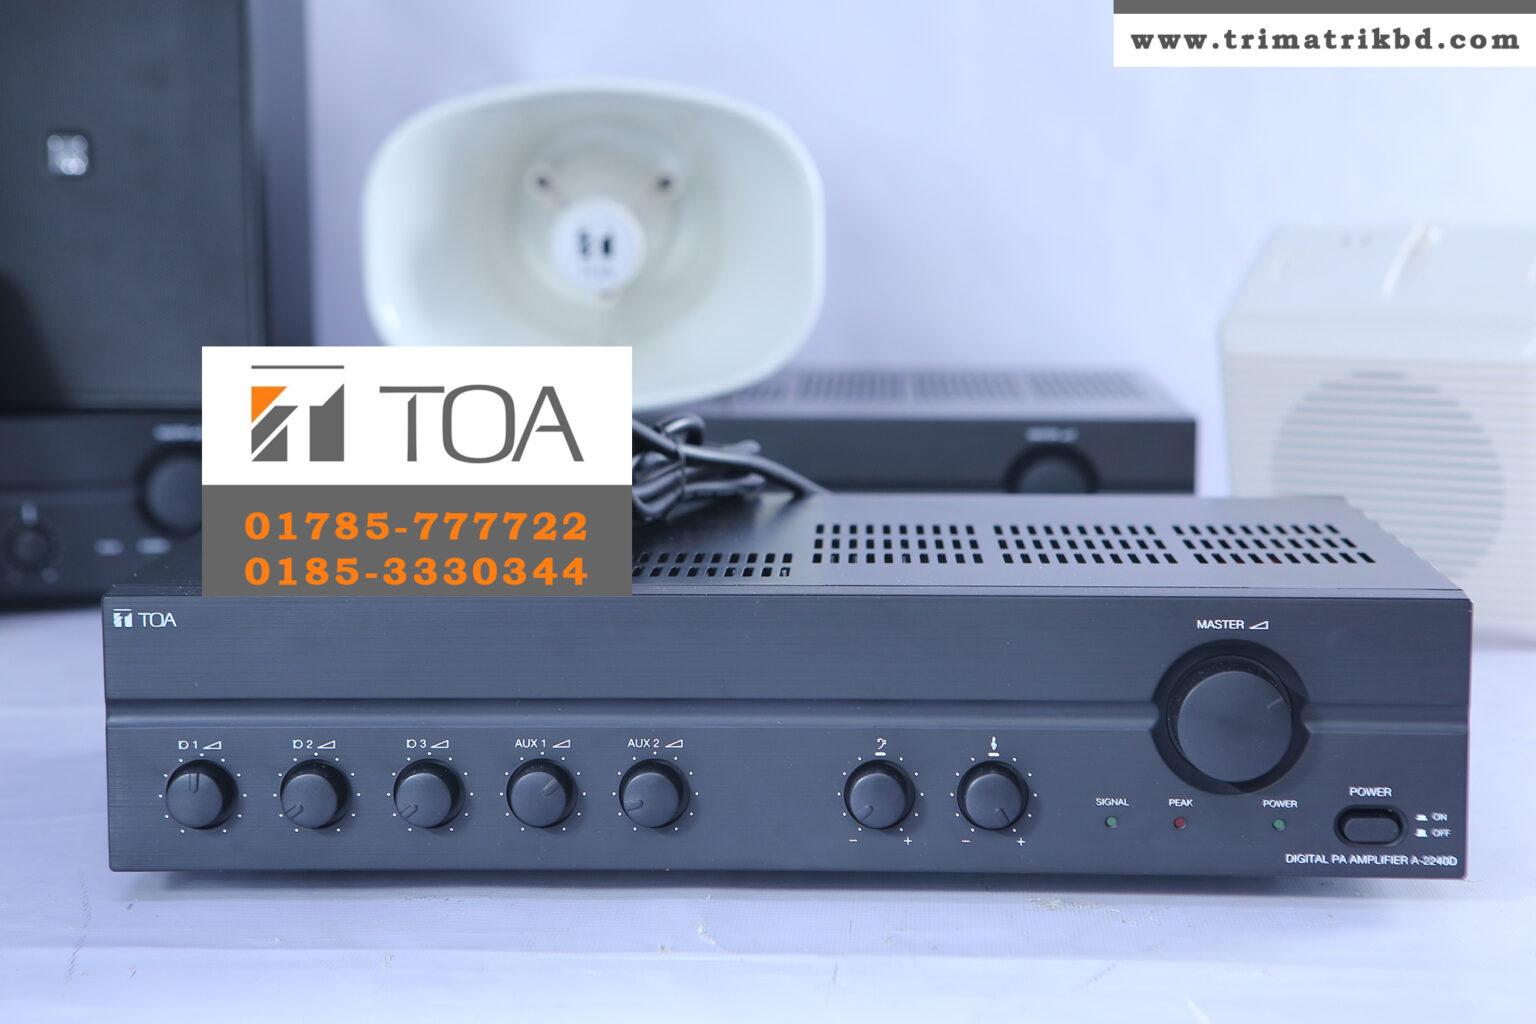 TOA A-2240 Price in Bangladesh